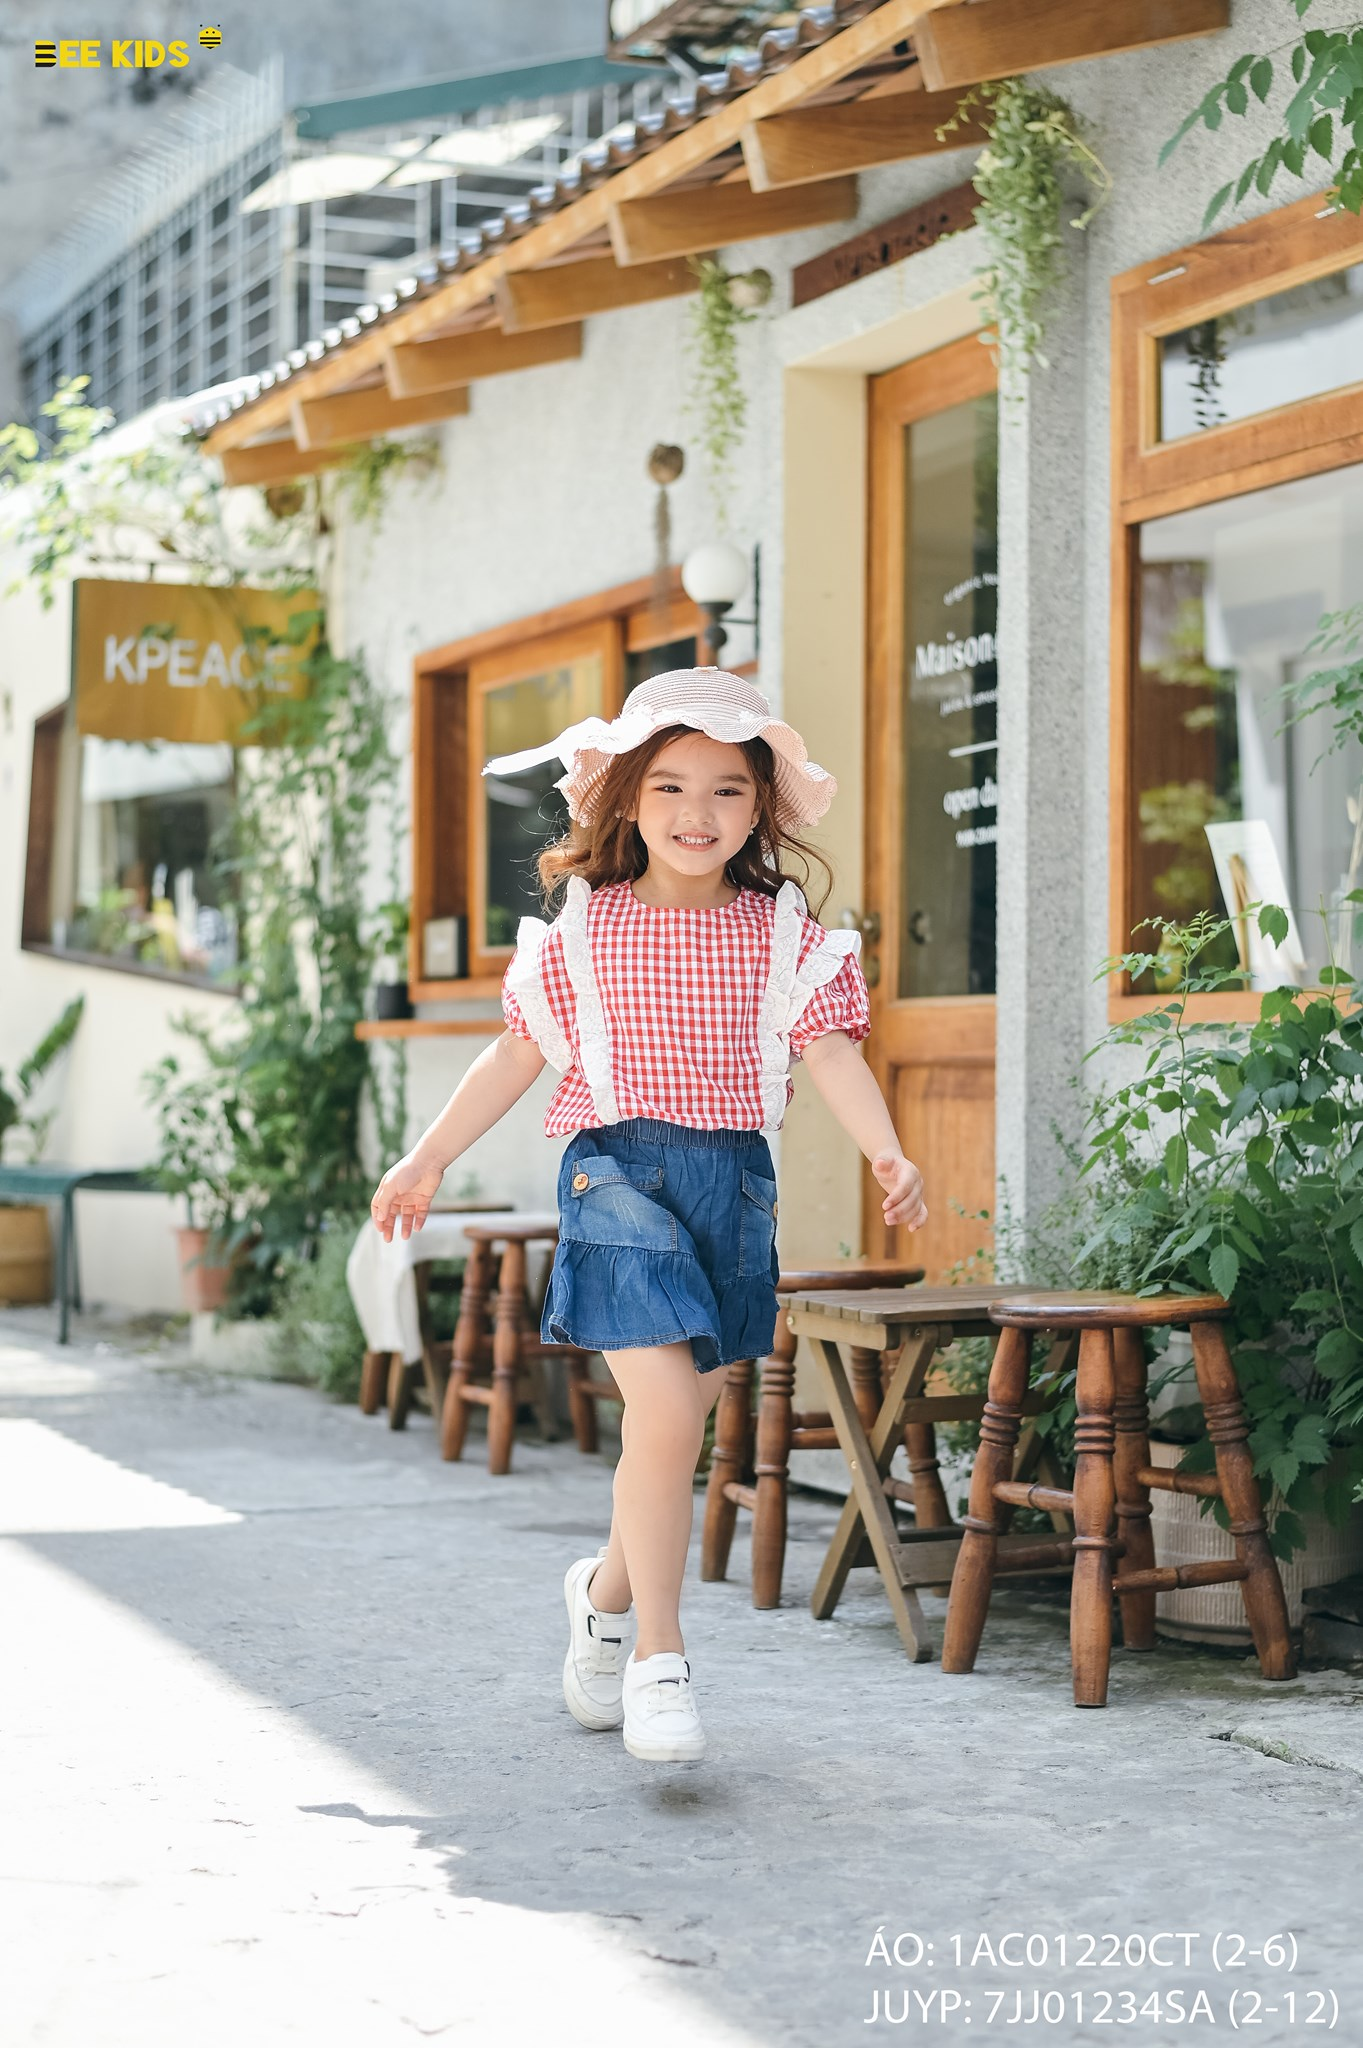 Áo thô bé gái size 2-6 tuổi